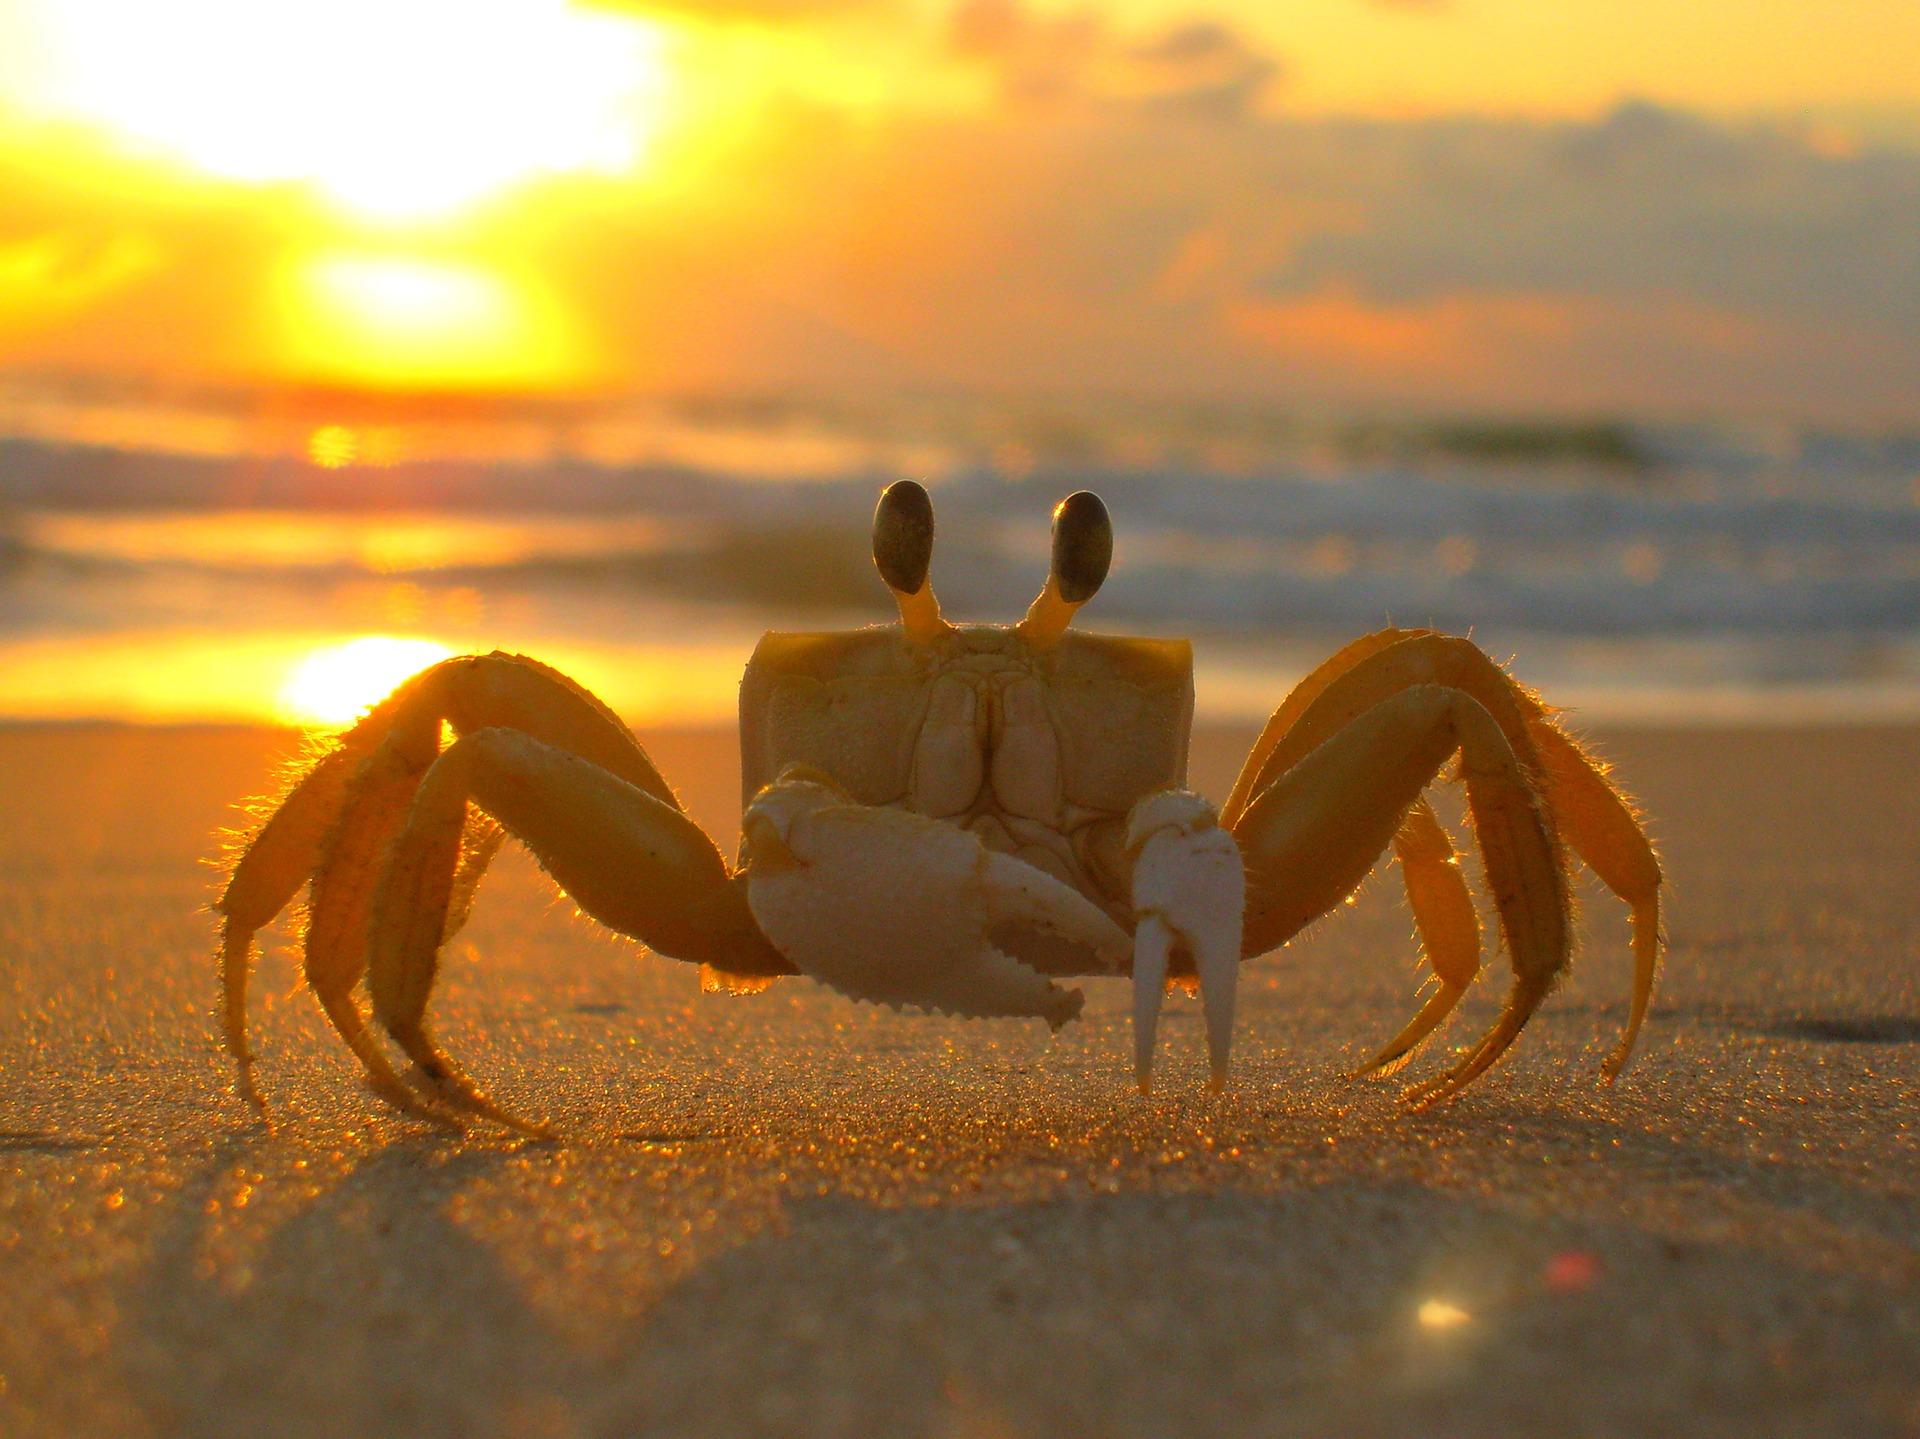 astrology-cancer-crab-pixabay-public-domain